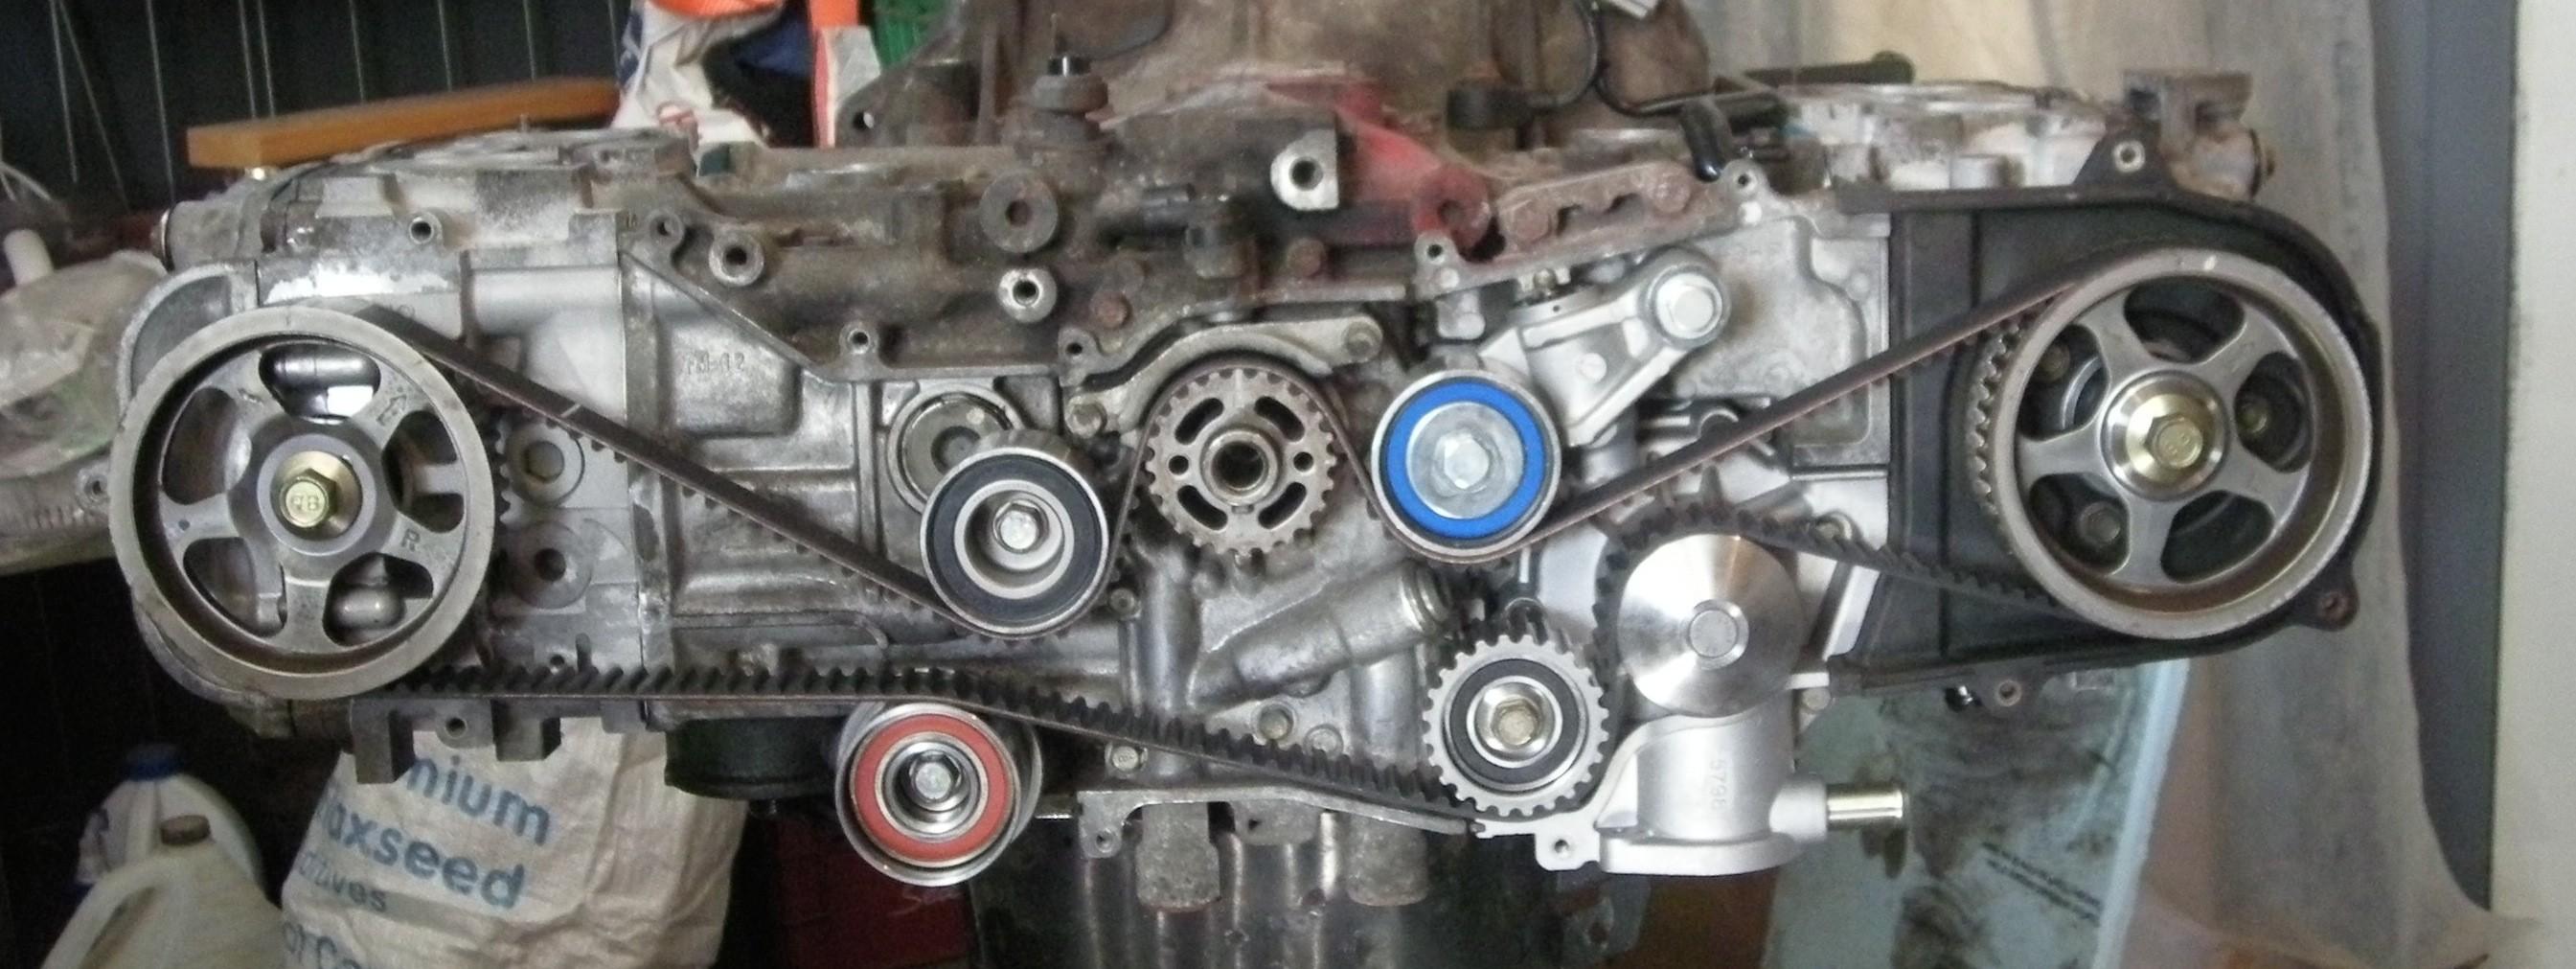 Subaru Ej25 Engine Diagram